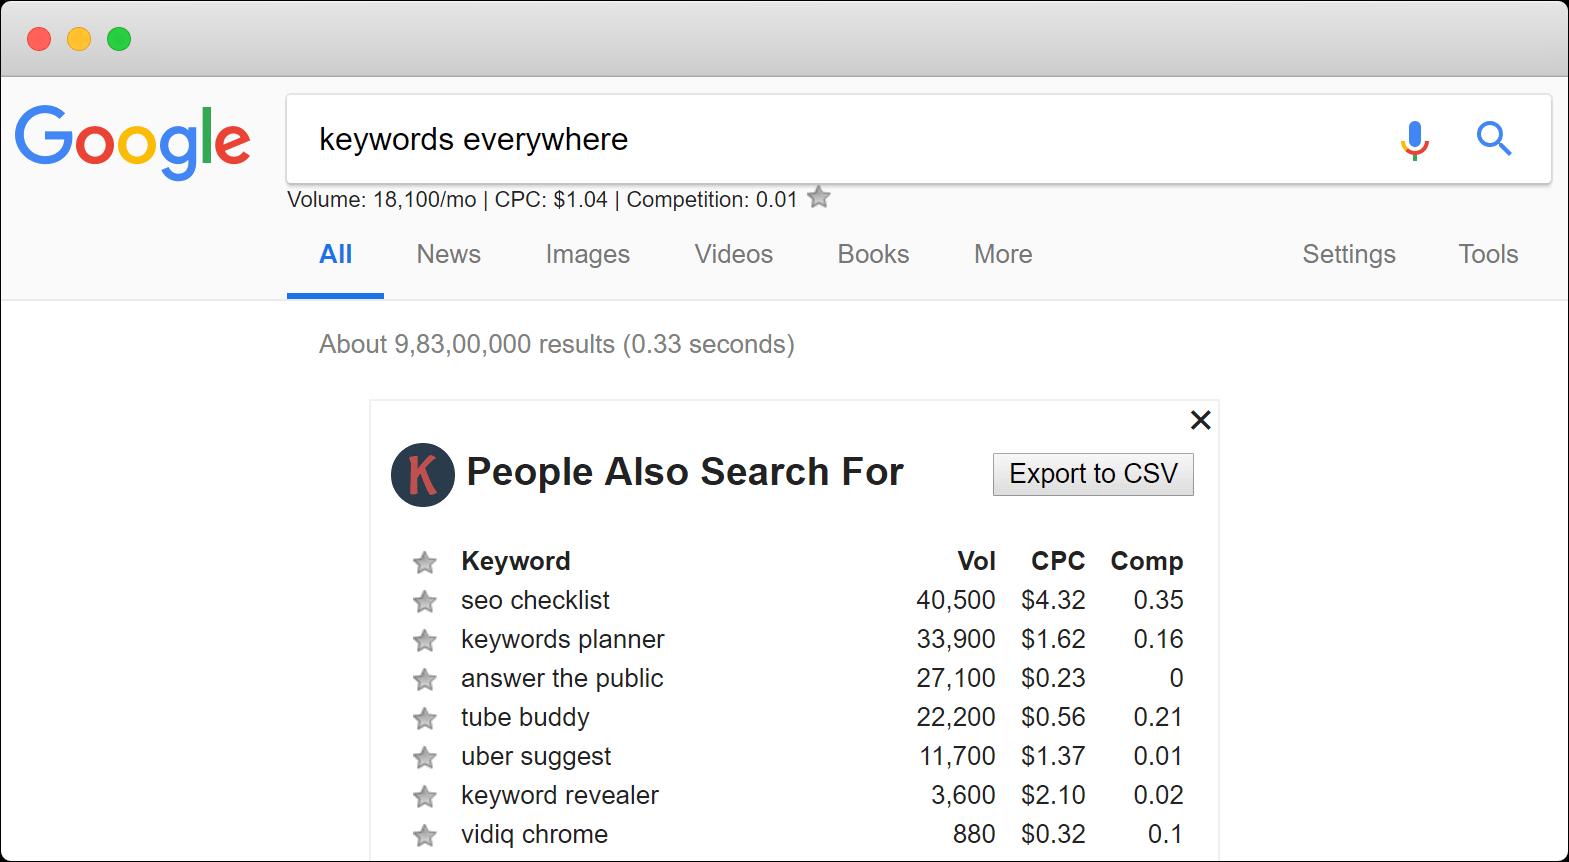 google keywords everywhere search interface